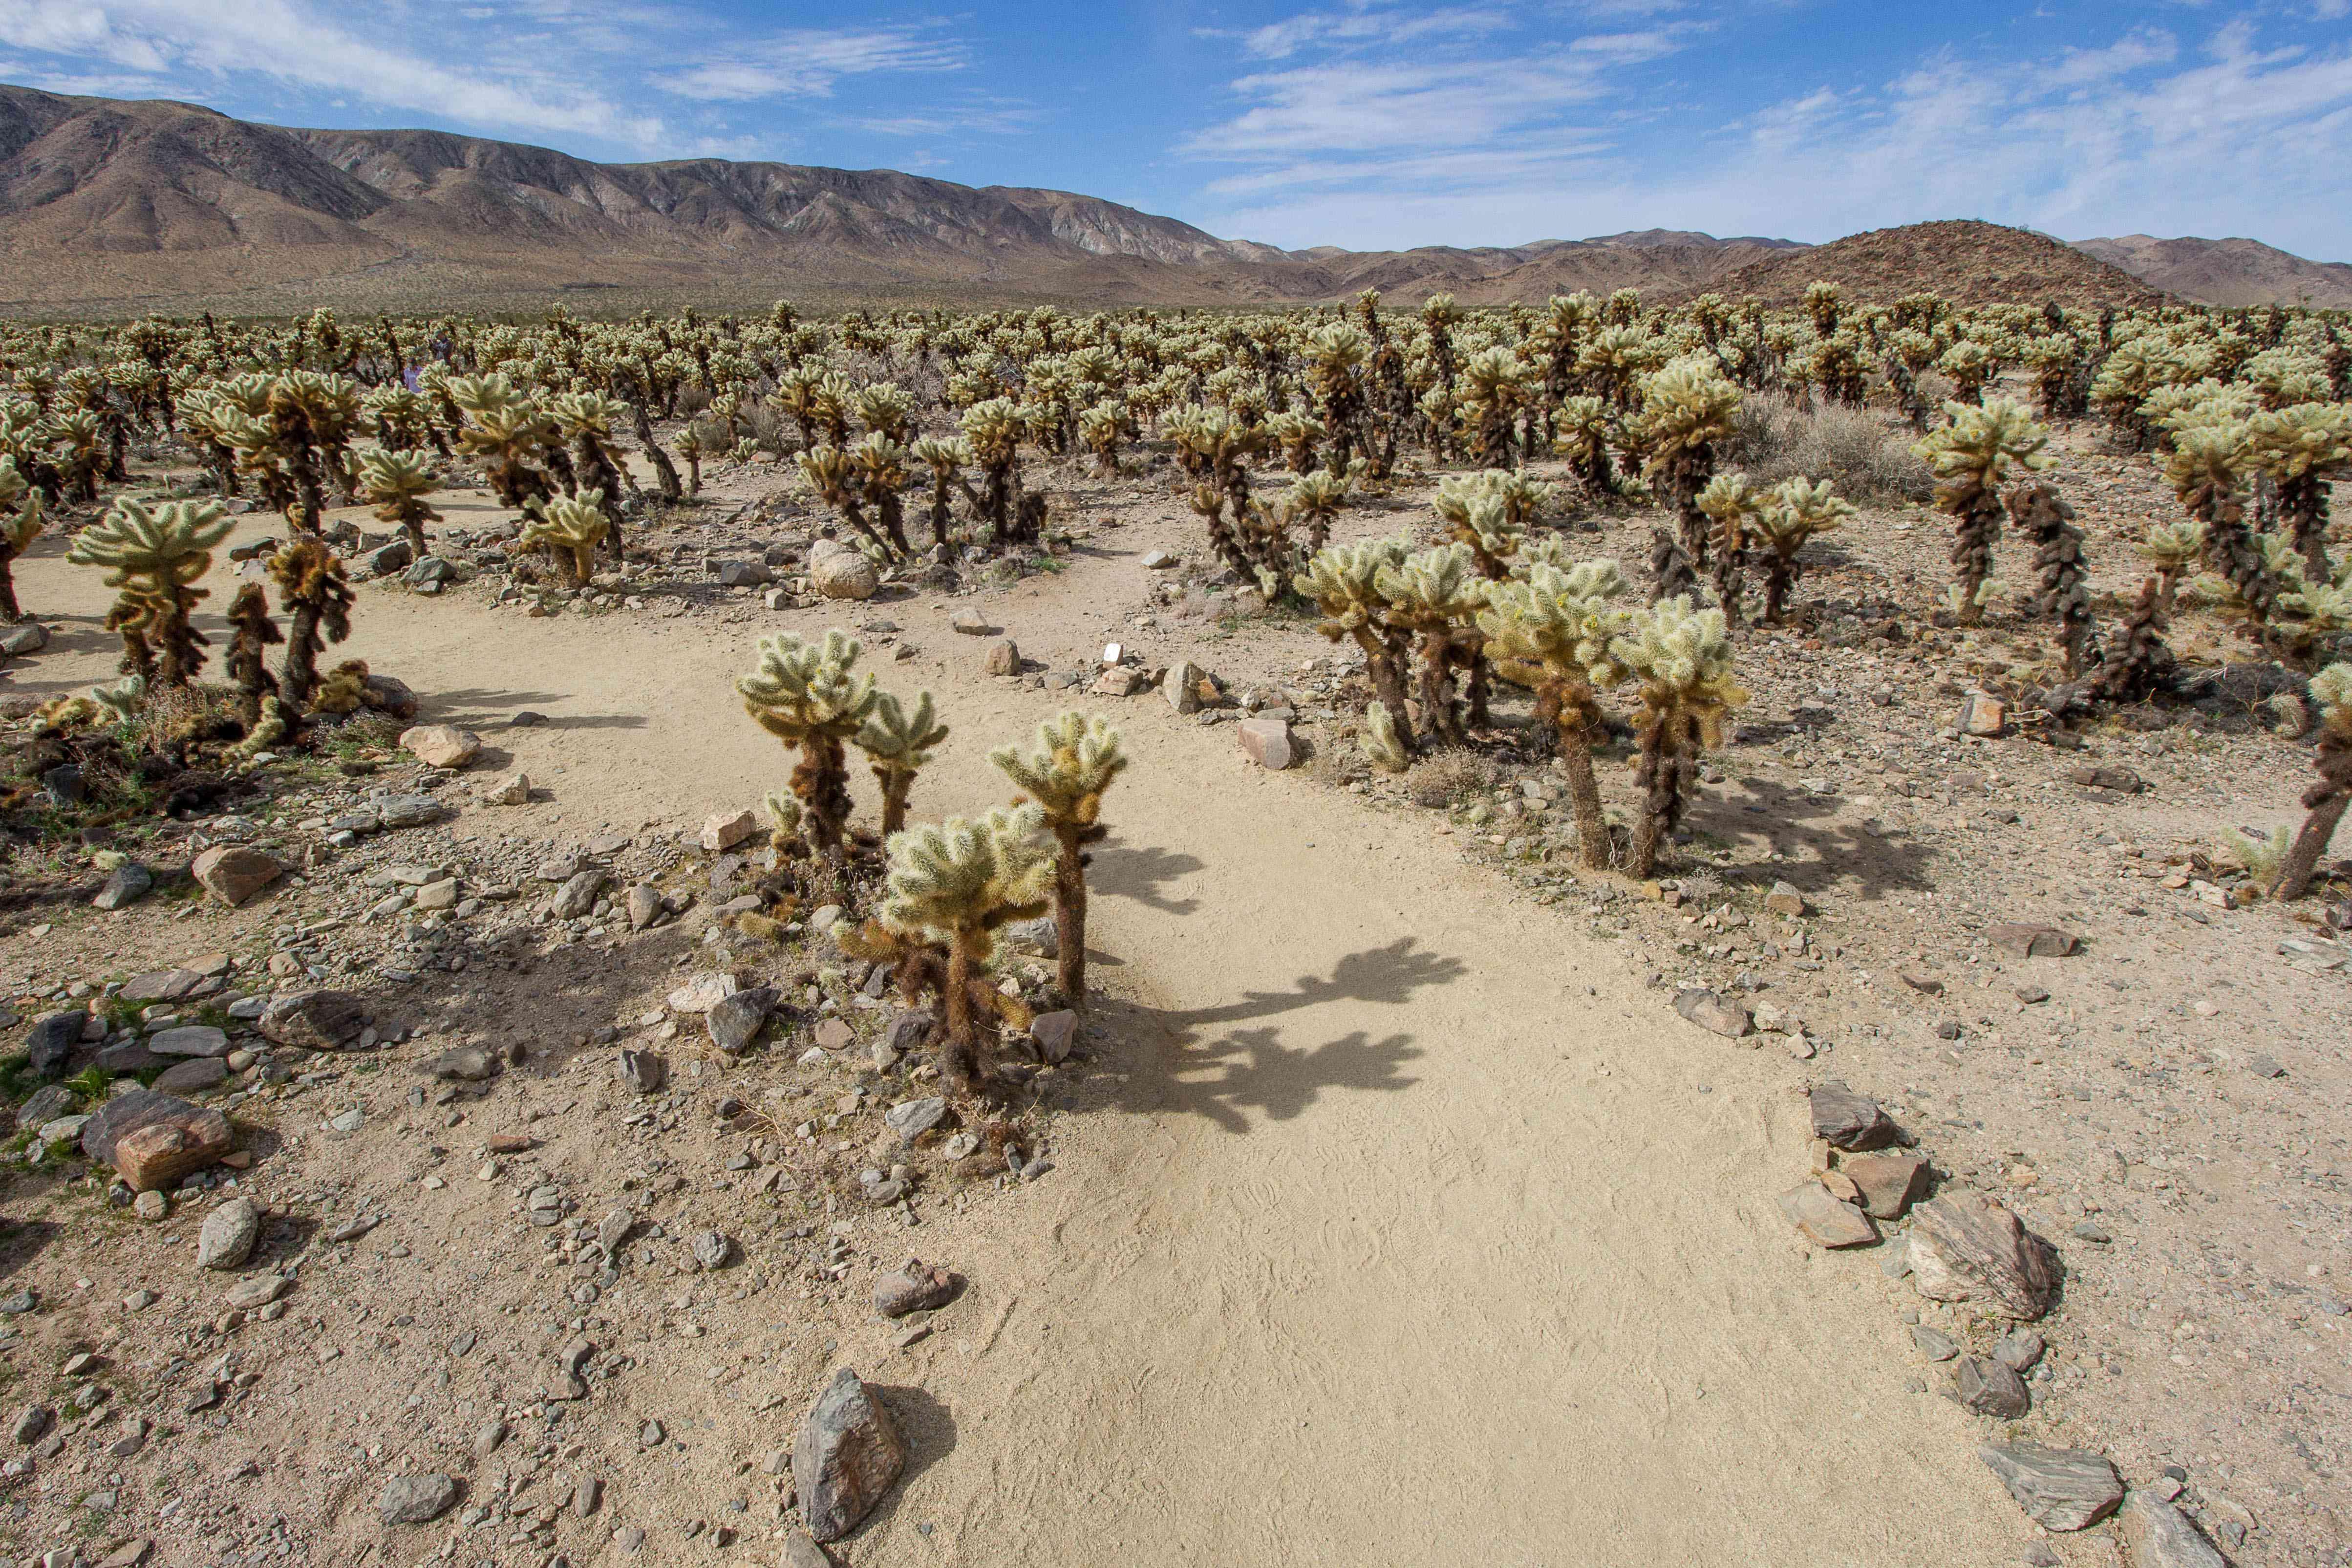 a walking path through cacti in Joshua Tree